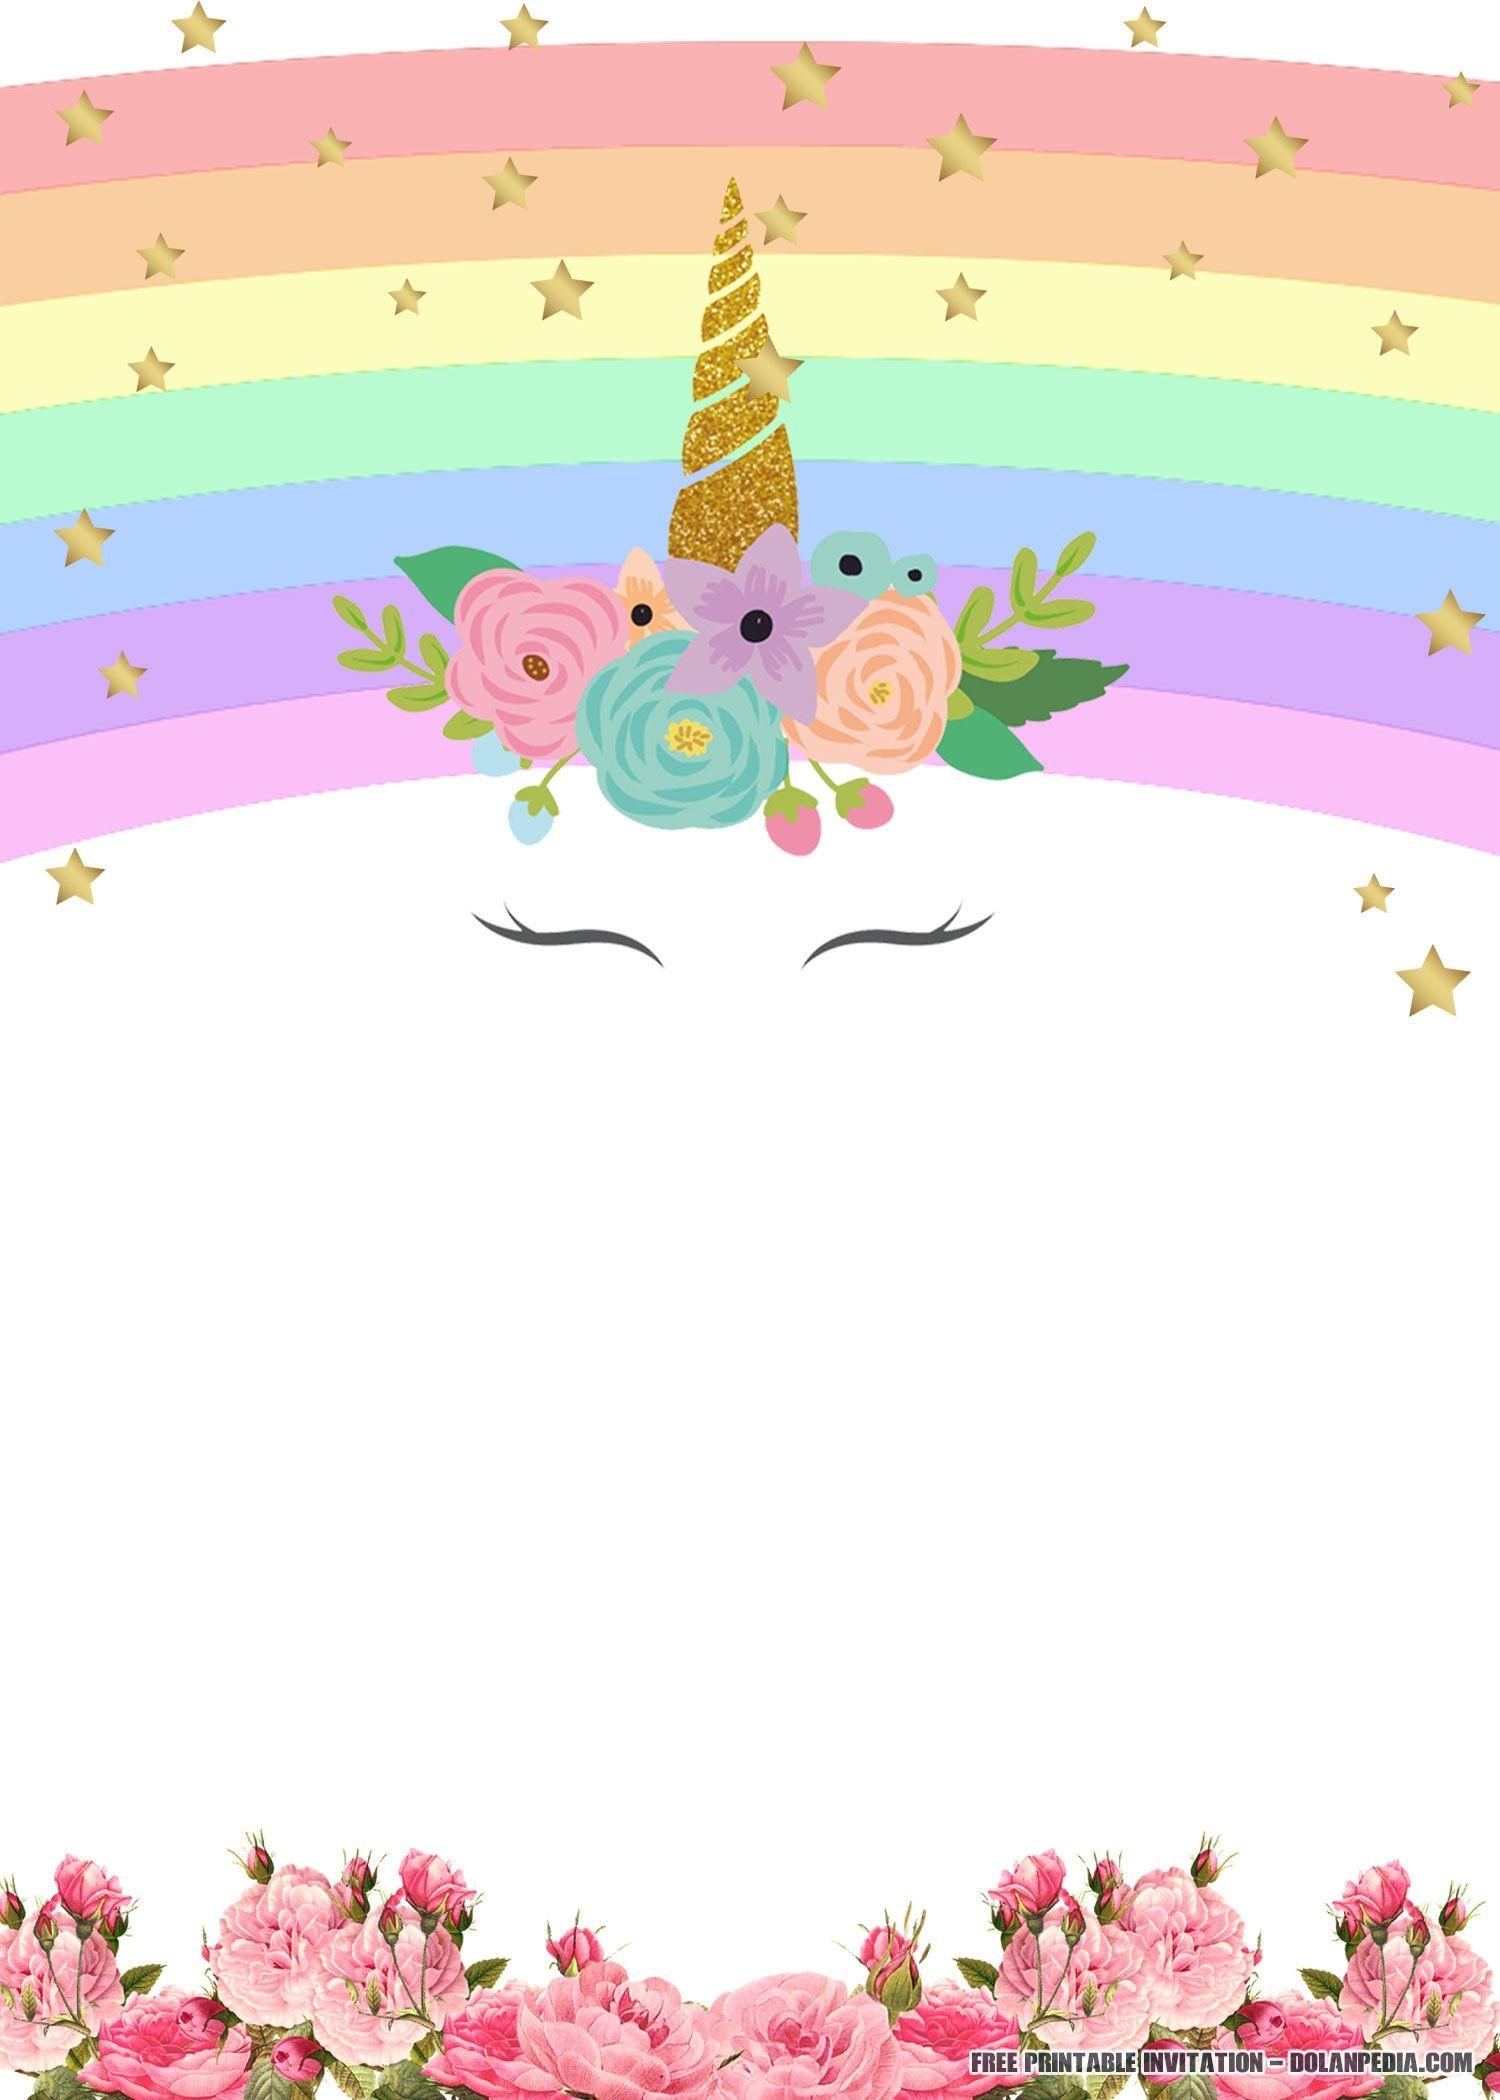 Free Printable Golden Unicorn Birthday Invitation Template   Unicorn - Free Printable Unicorn Template